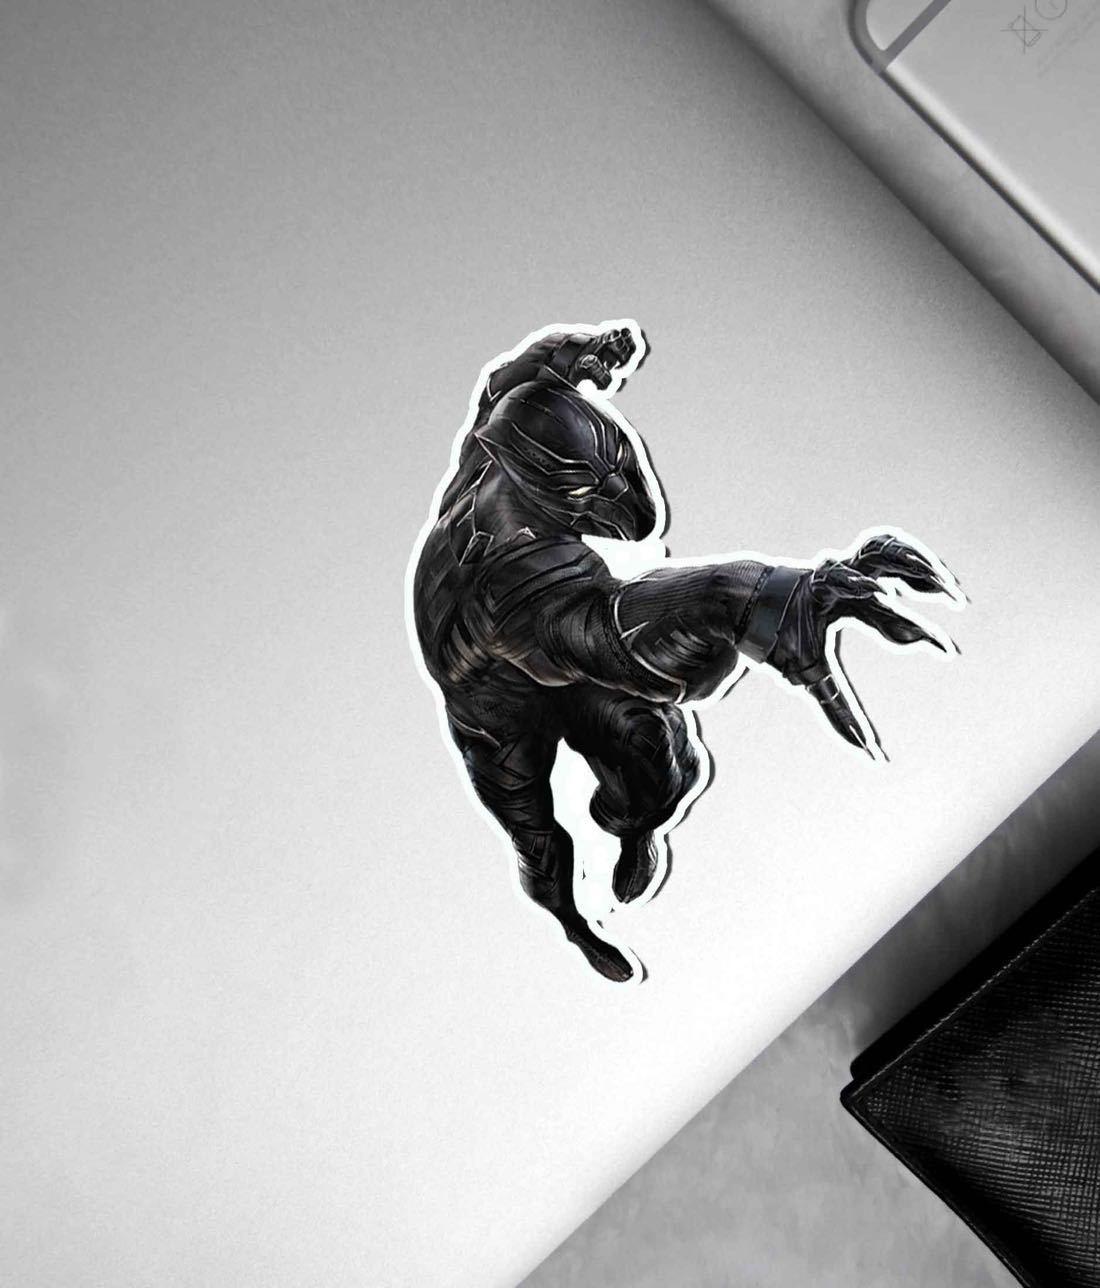 Black Panther Attack - Macmerise Stickon Small